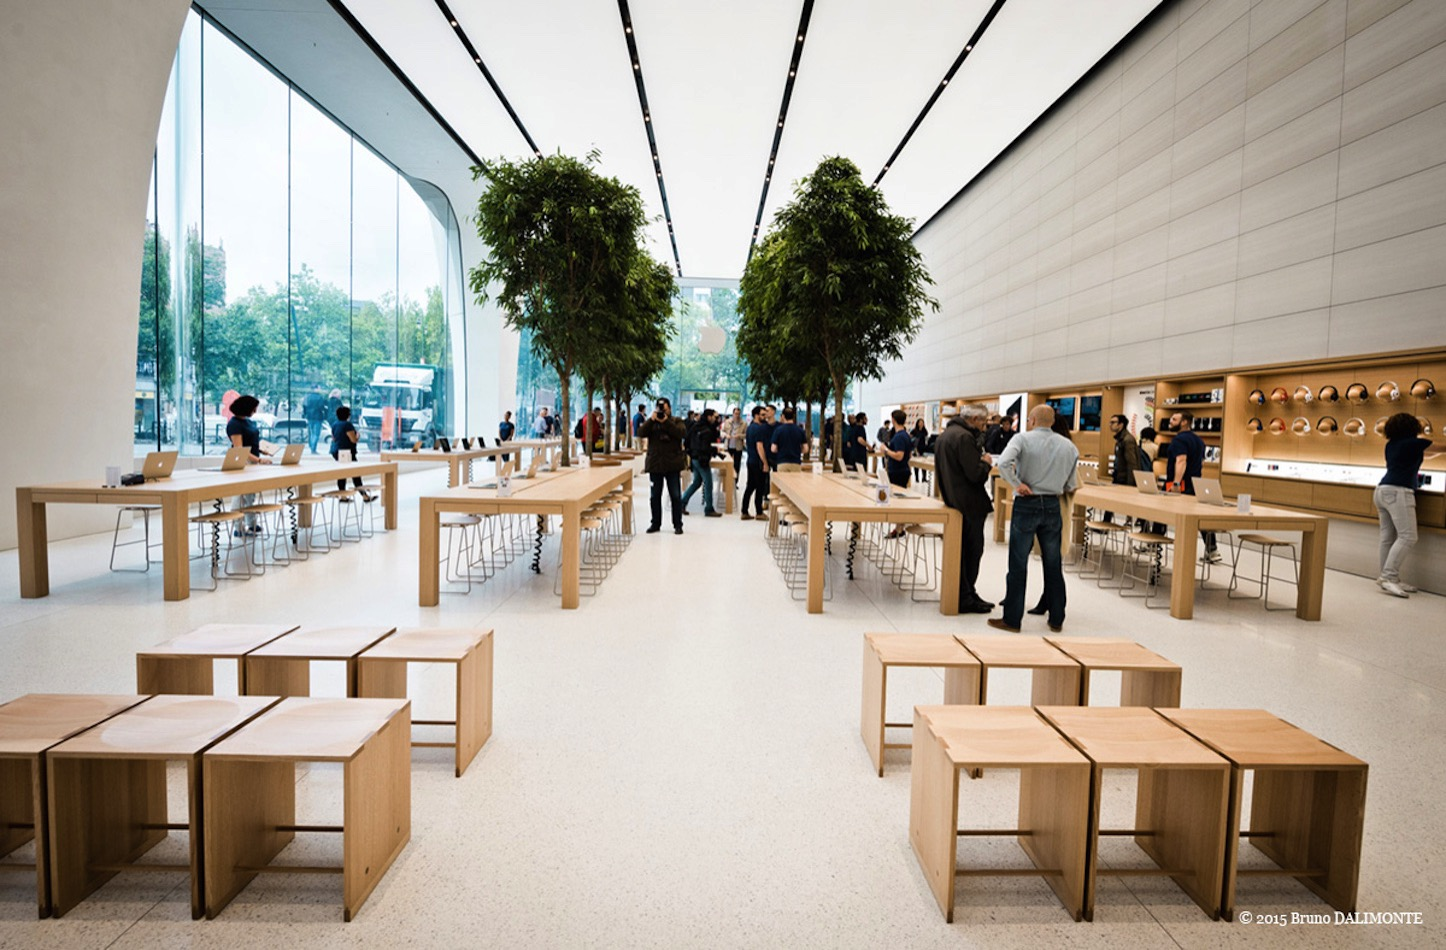 Jony ive designed apple store